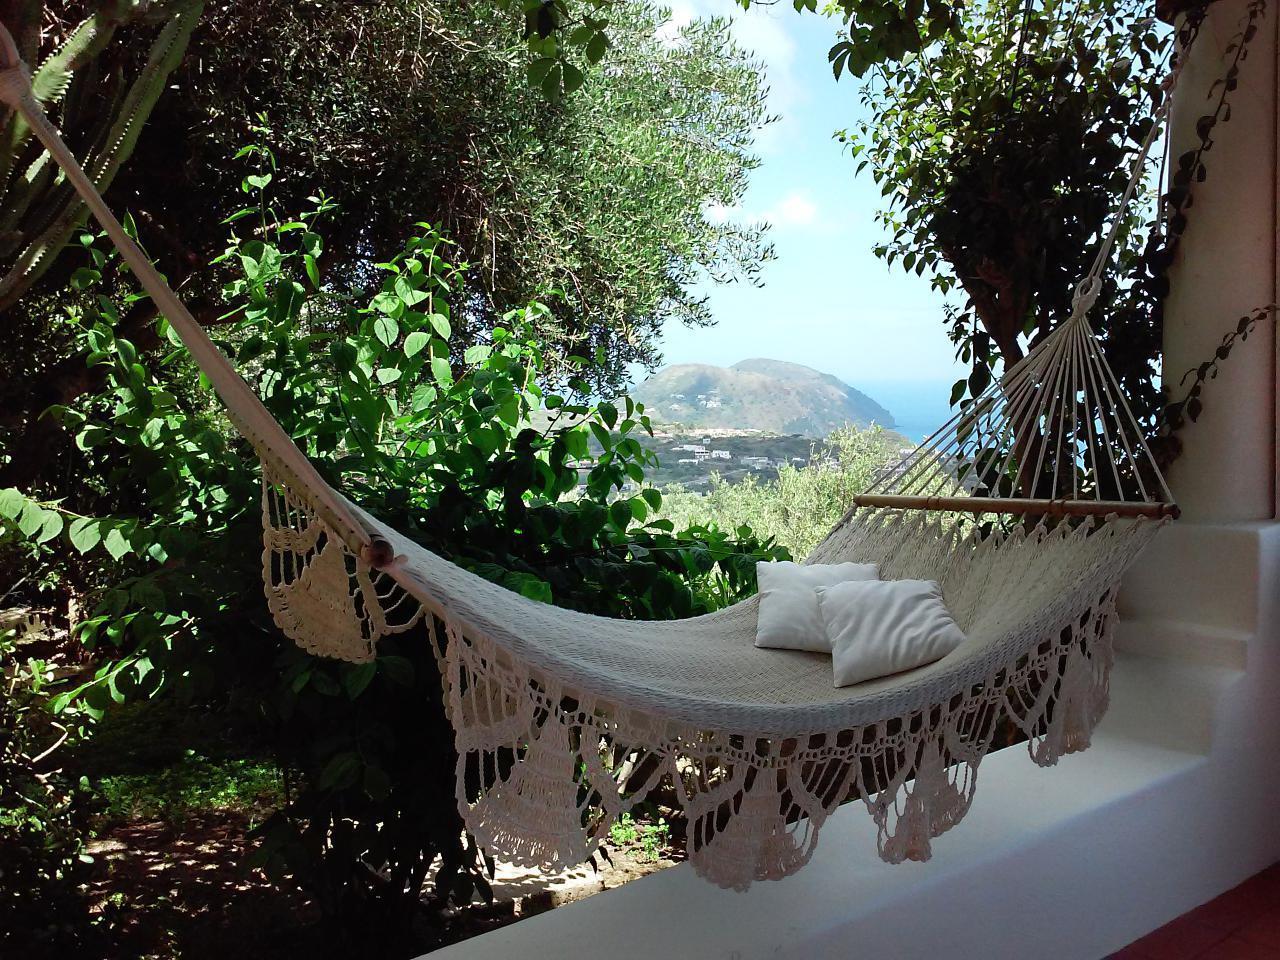 Maison de vacances Ferienhaushälfte Solandra auf sizilianischer Insel mit atemberaubenden Meeres-Rundblick (2038046), Lipari, Lipari, Sicile, Italie, image 1